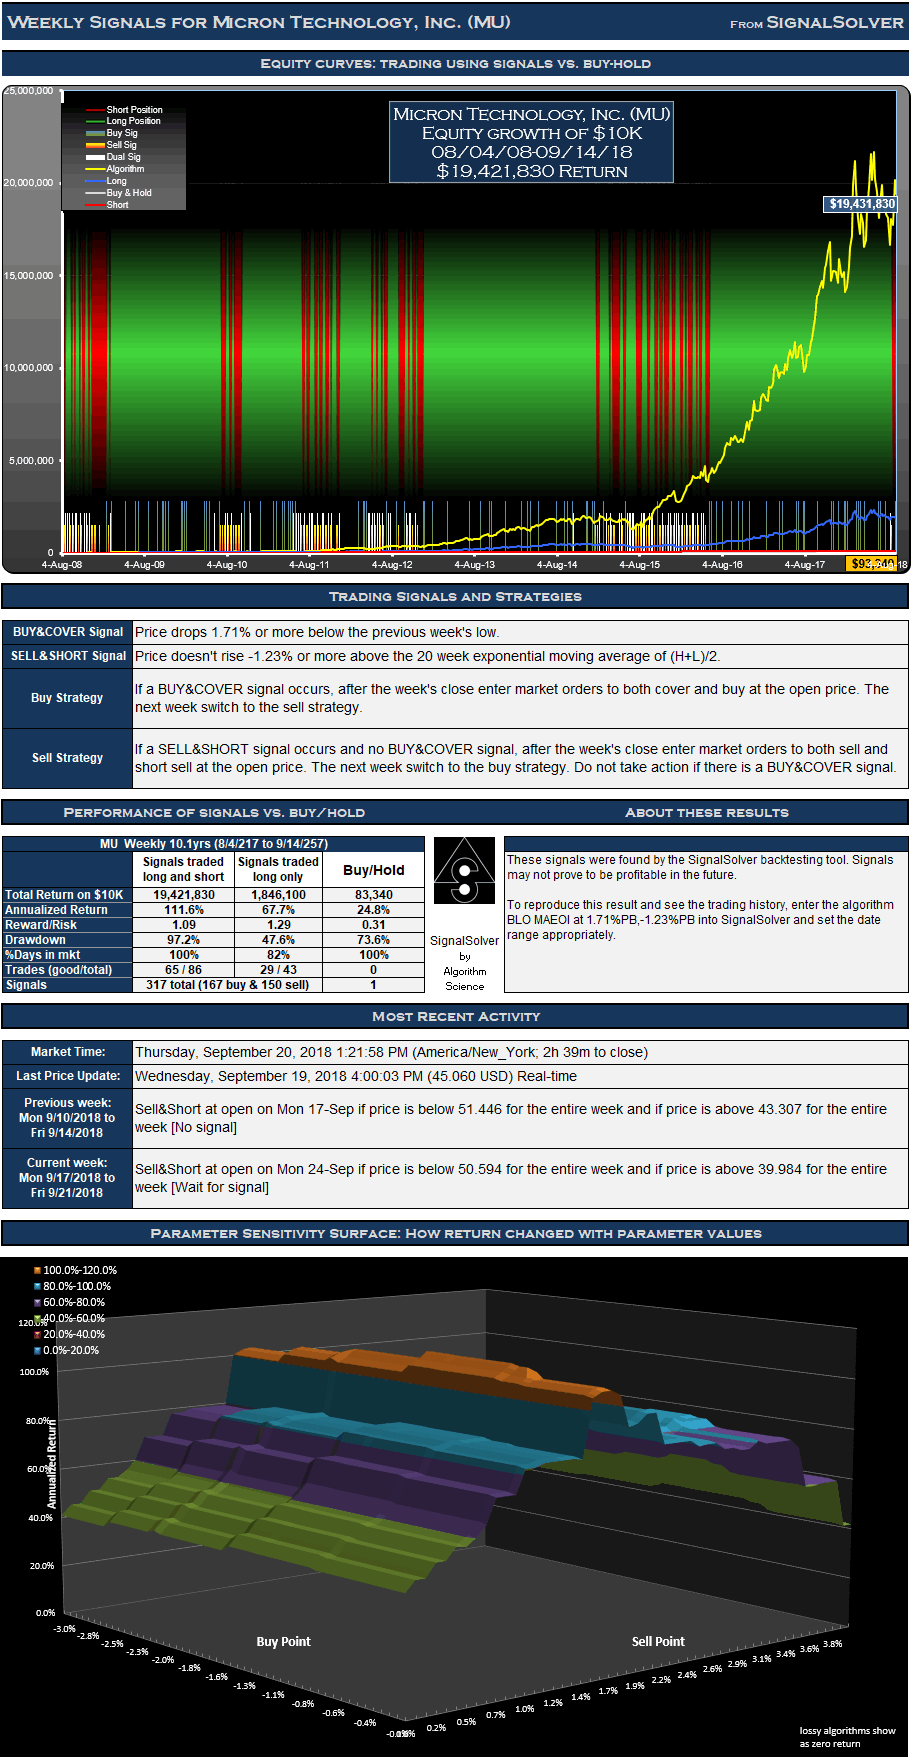 Micron MU Signals Weekly